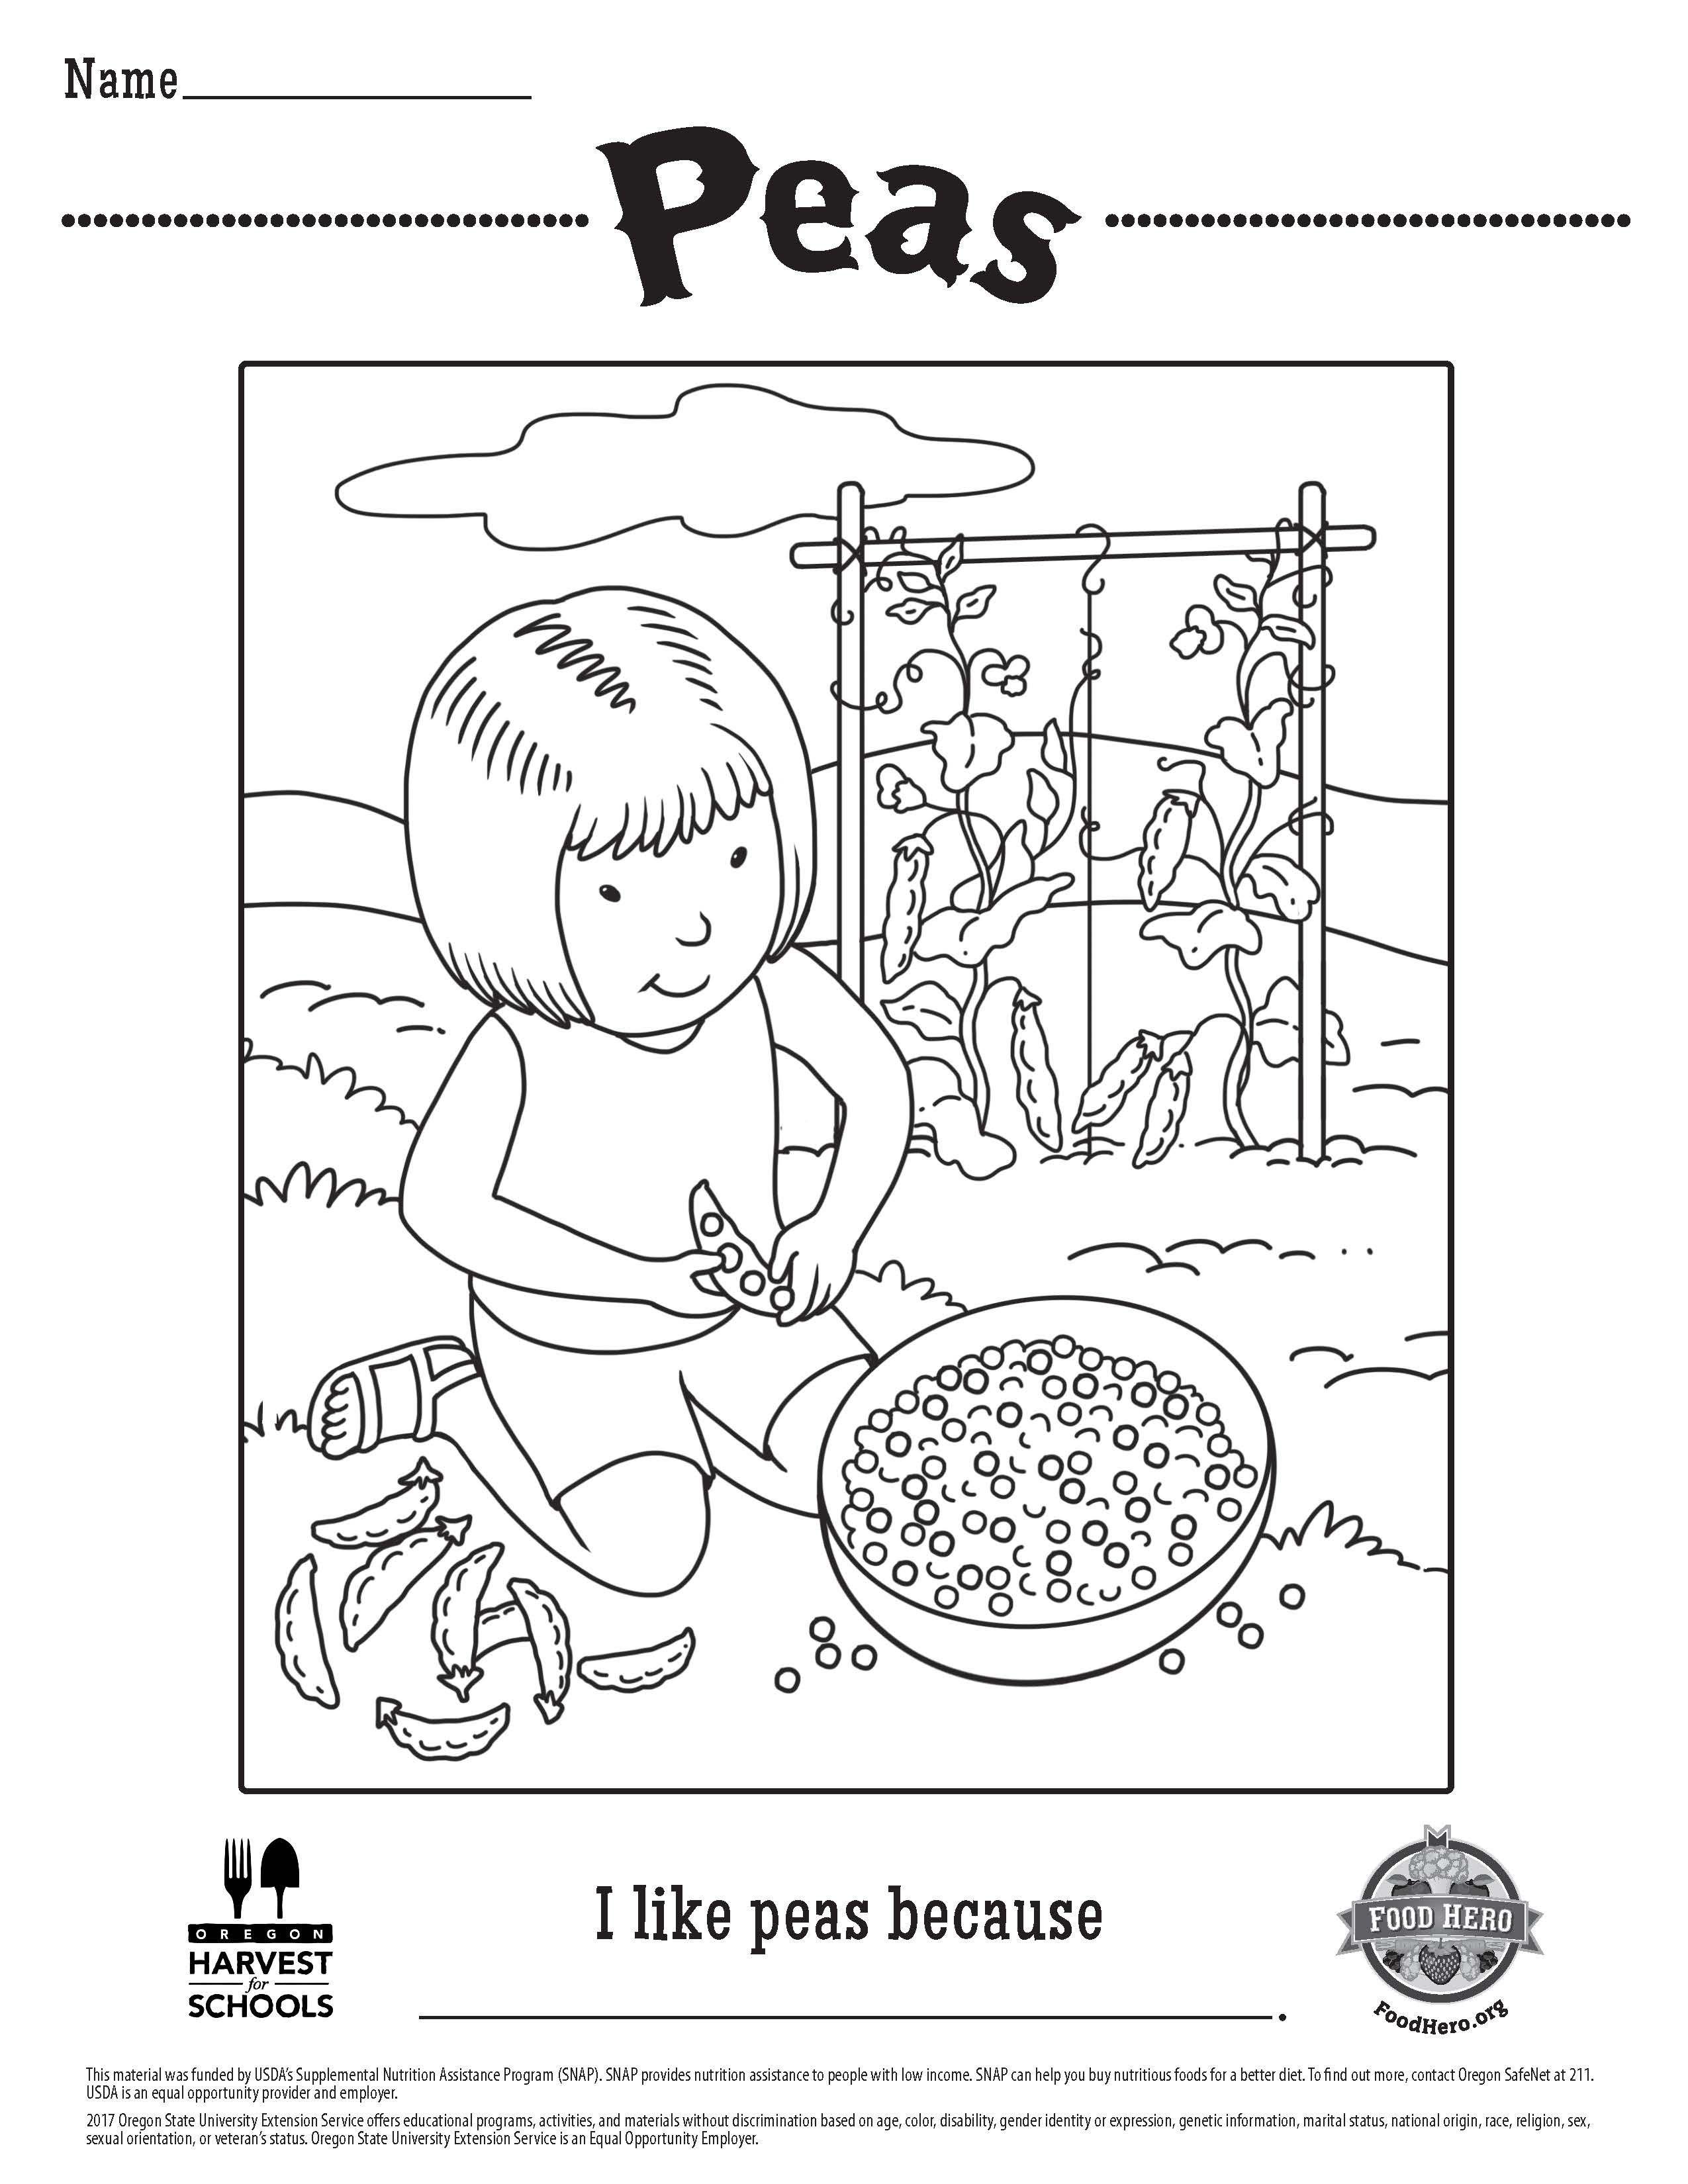 Free Printable Children\'s Coloring Sheet Food Hero Peas. Kids ...